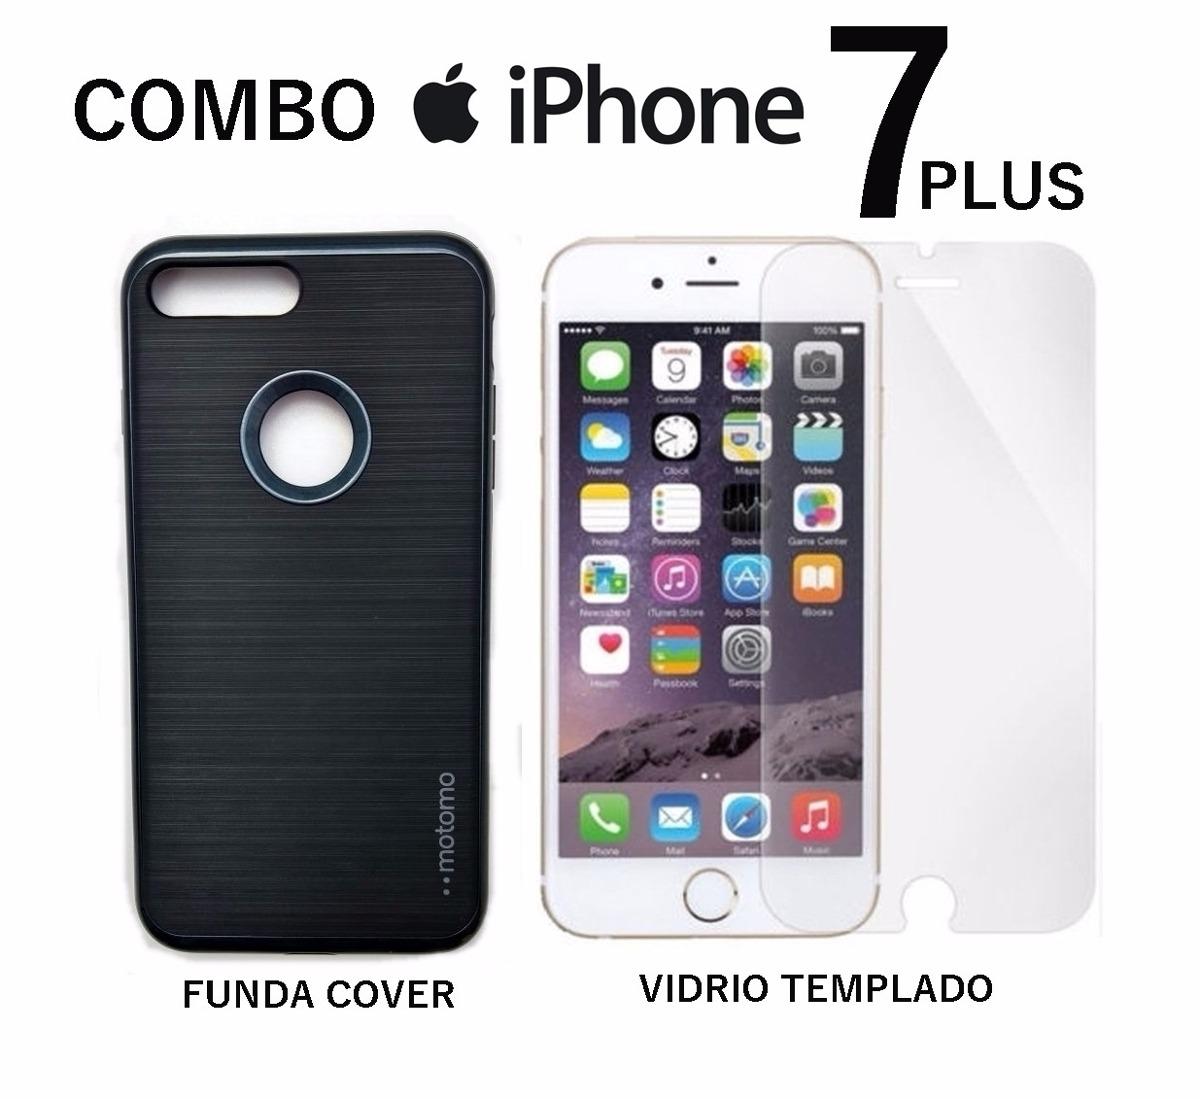 6def98f3ad6 combo vidrio templado + funda apple iphone 7 plus rosario. Cargando zoom.